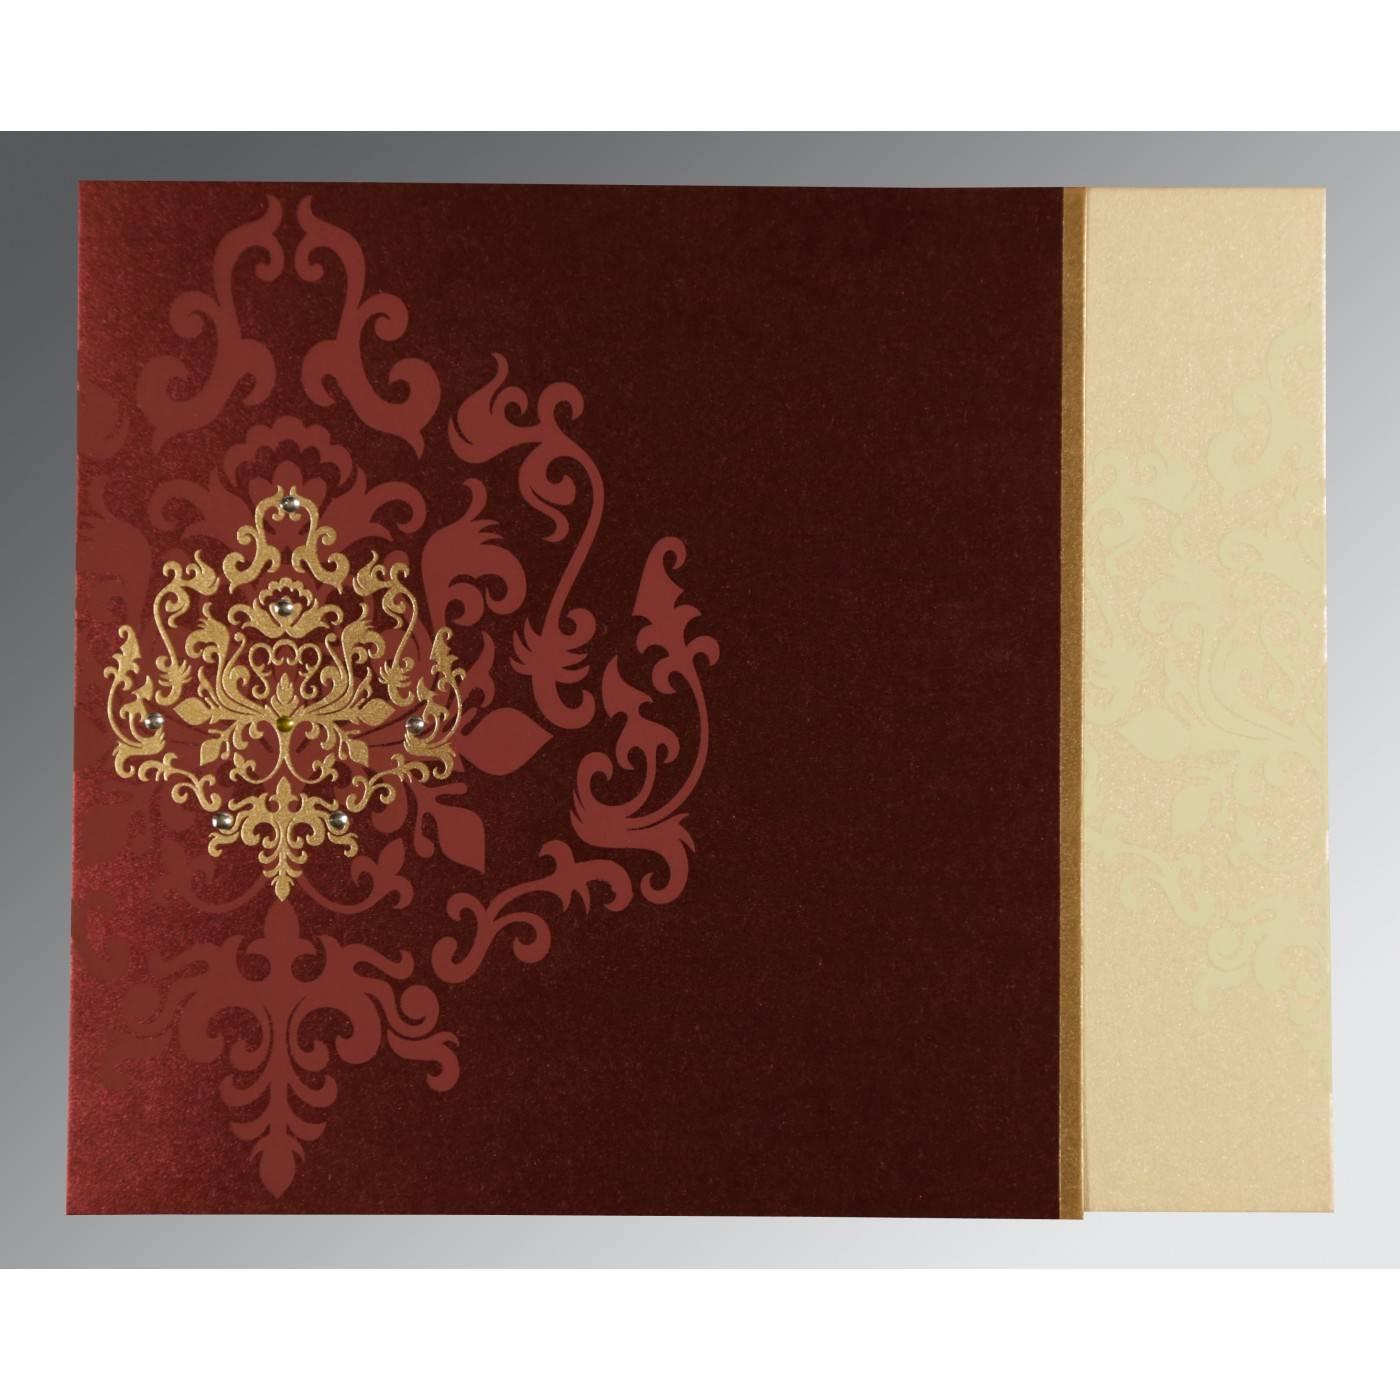 DERBY BROWN SHIMMERY DAMASK THEMED - SCREEN PRINTED WEDDING CARD : CIN-8253F - IndianWeddingCards